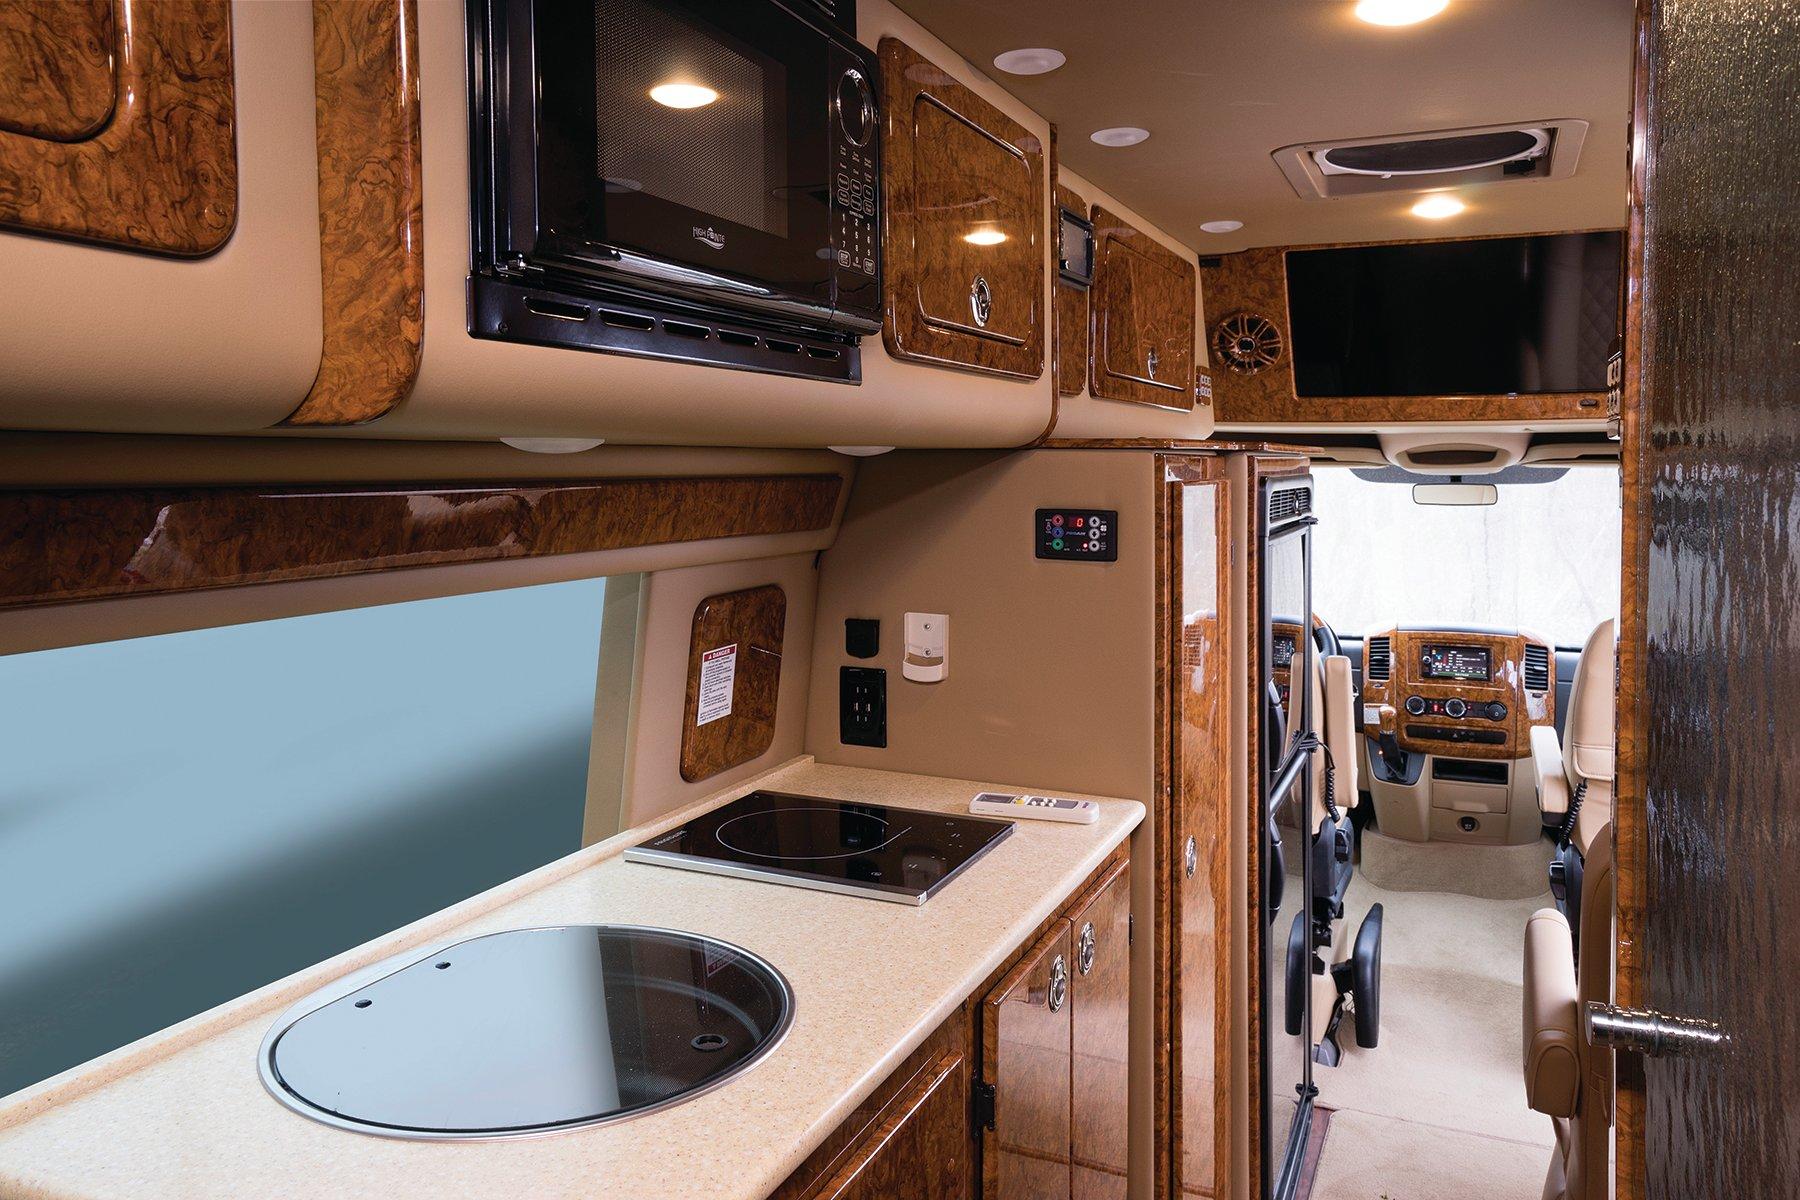 Interior of Midwest Automotive Designs Weekender Class B motorhome